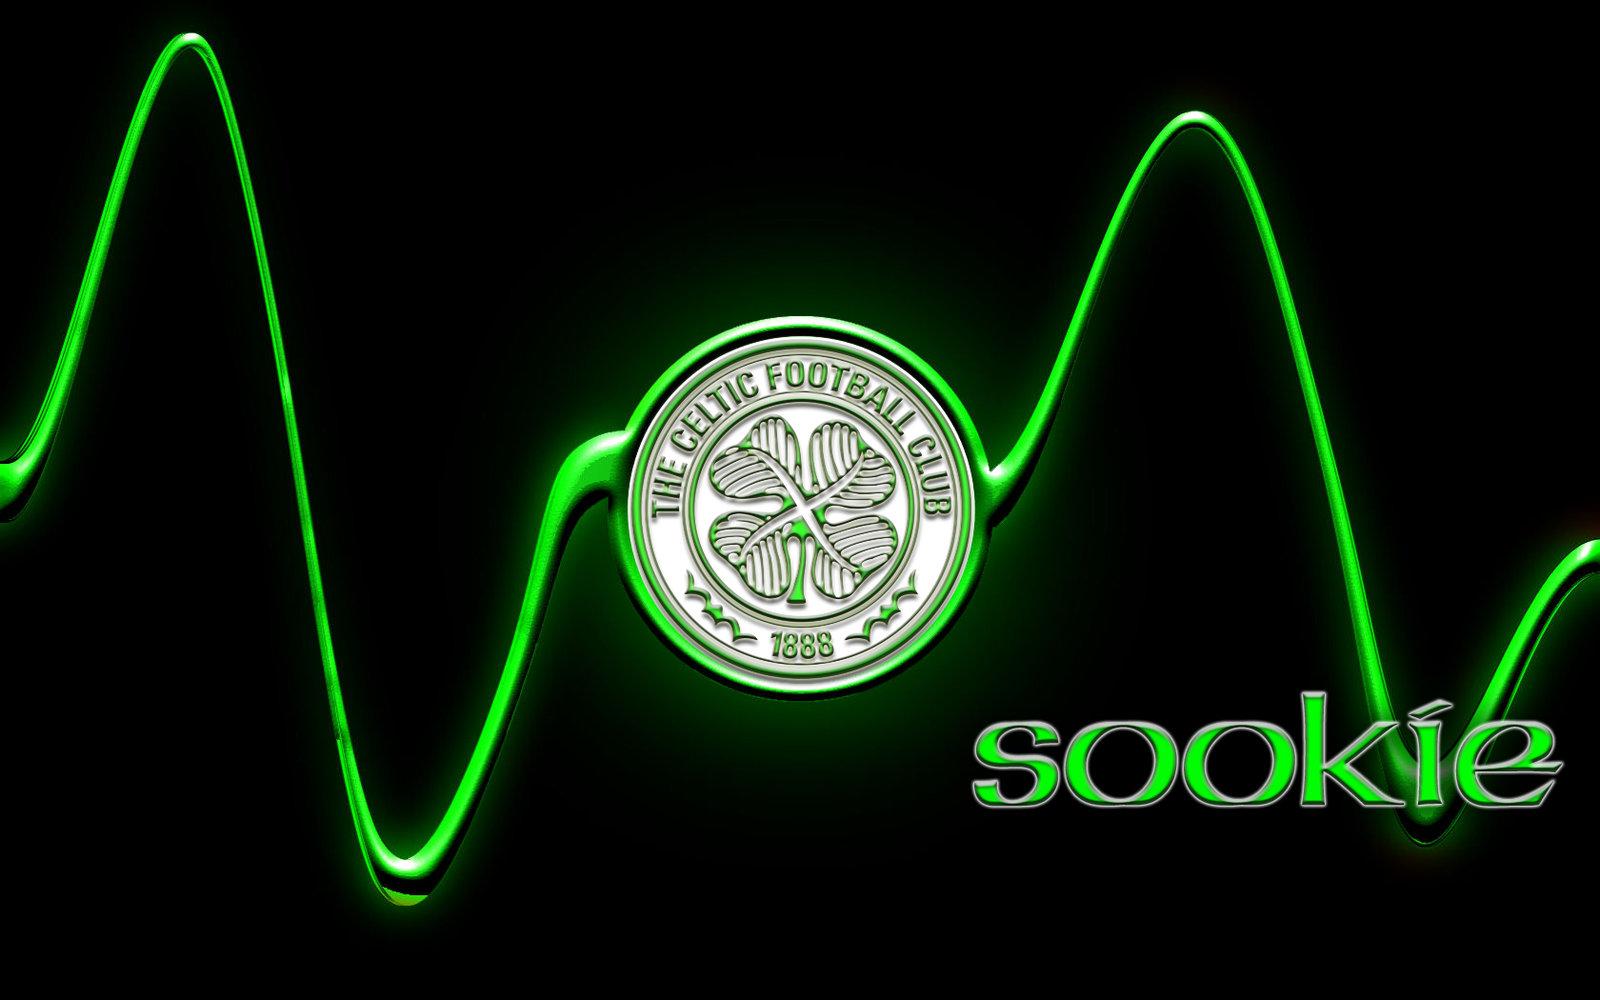 Sookie Celtic FC Wallpaper 1 by sookiesooker 1600x1000